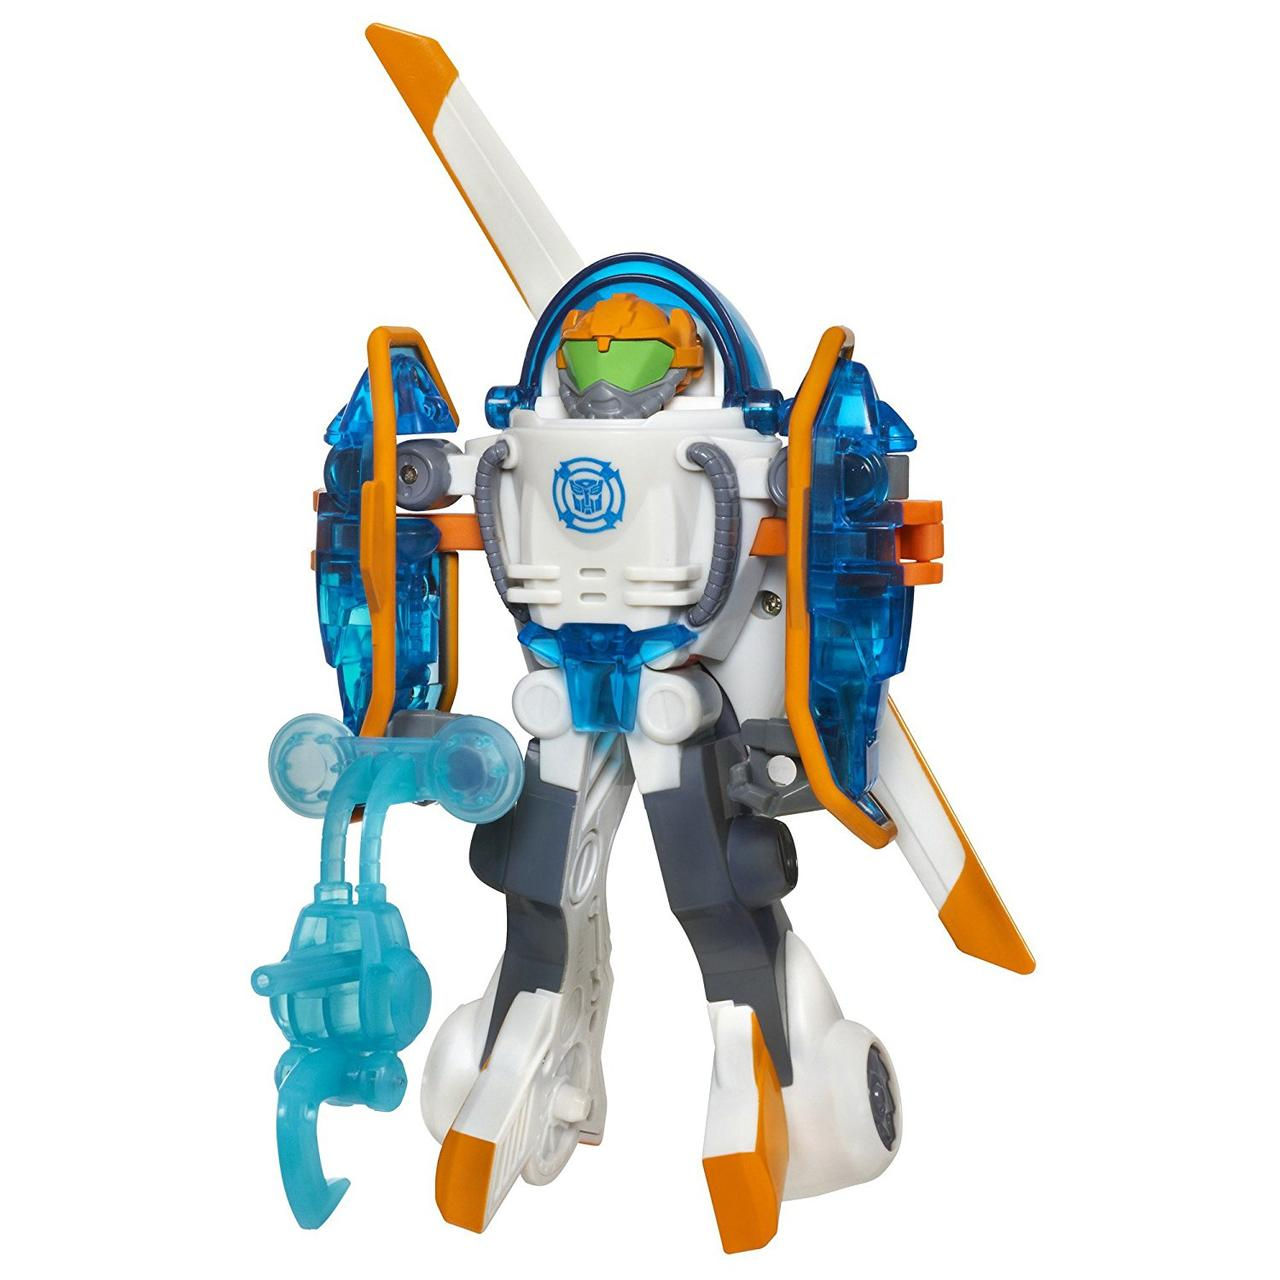 Трансформер Боты Спасатели Блейд Bots Blades The Copter-Bot